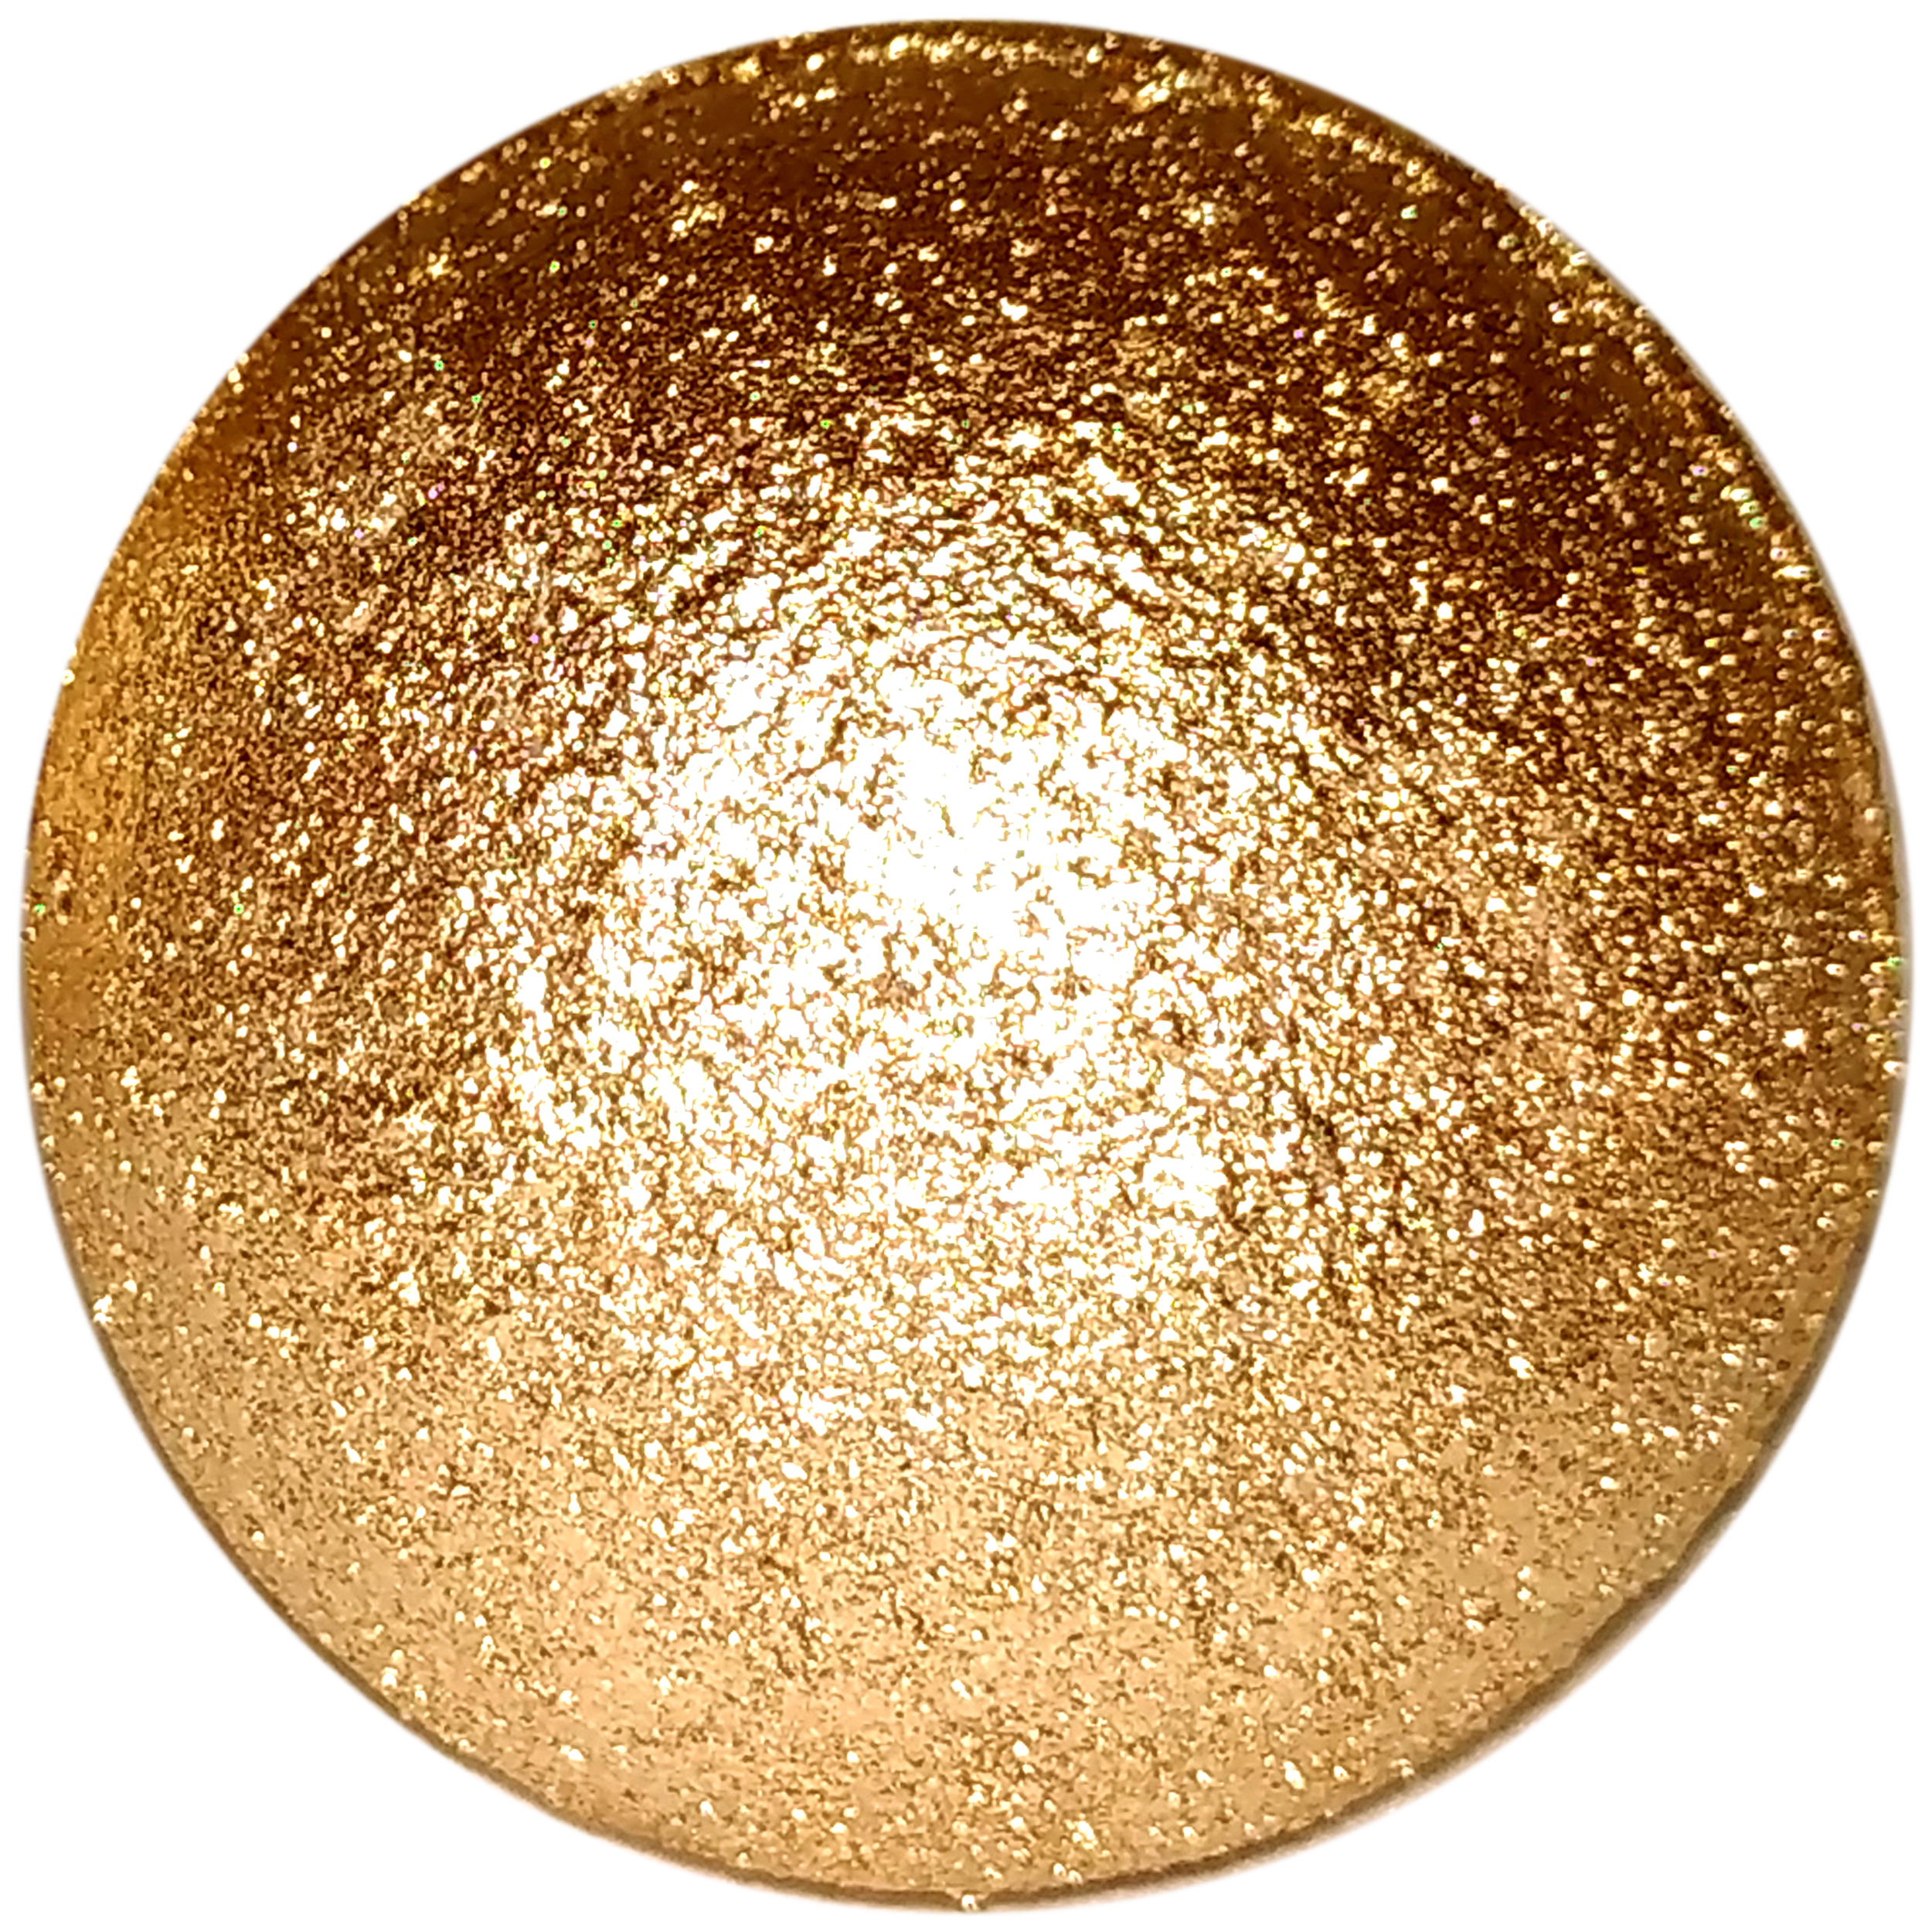 خرید                      کوکتل نمک حمام اور مدل Gold وزن 300 گرم بسته 3 عددی